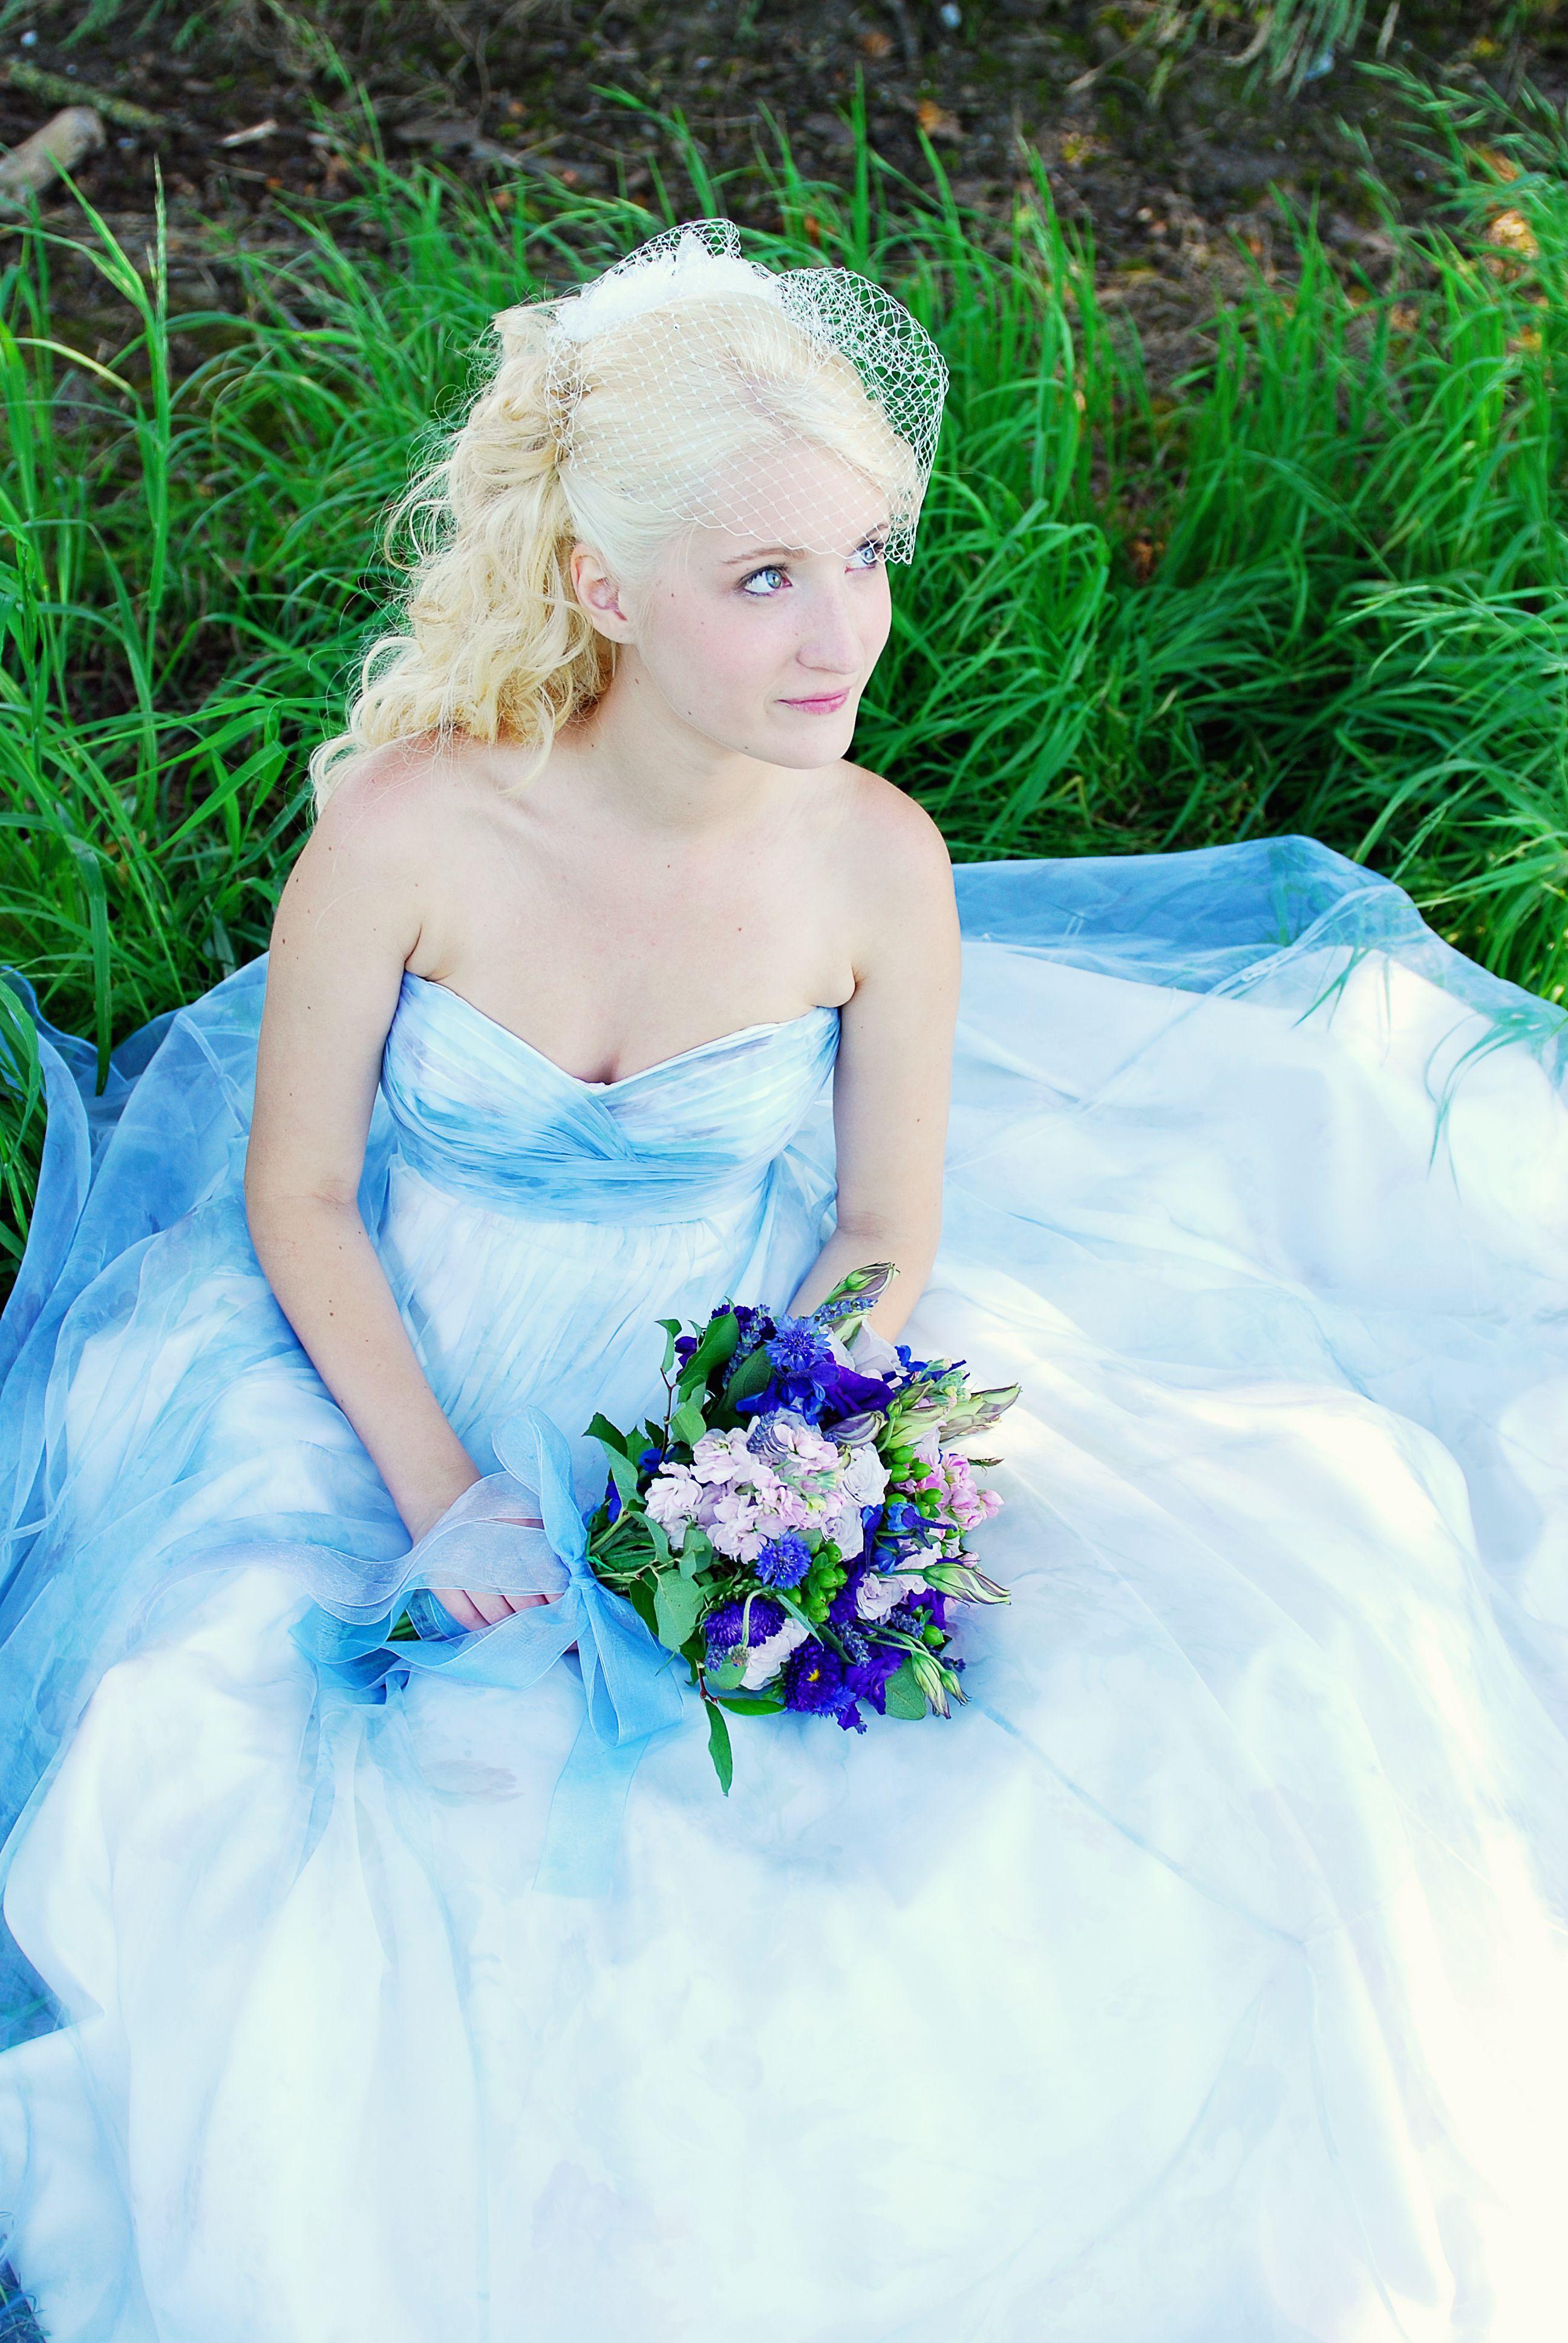 I\'m thinking of having an Alice in Wonderland Masq. wedding... Hmm ...